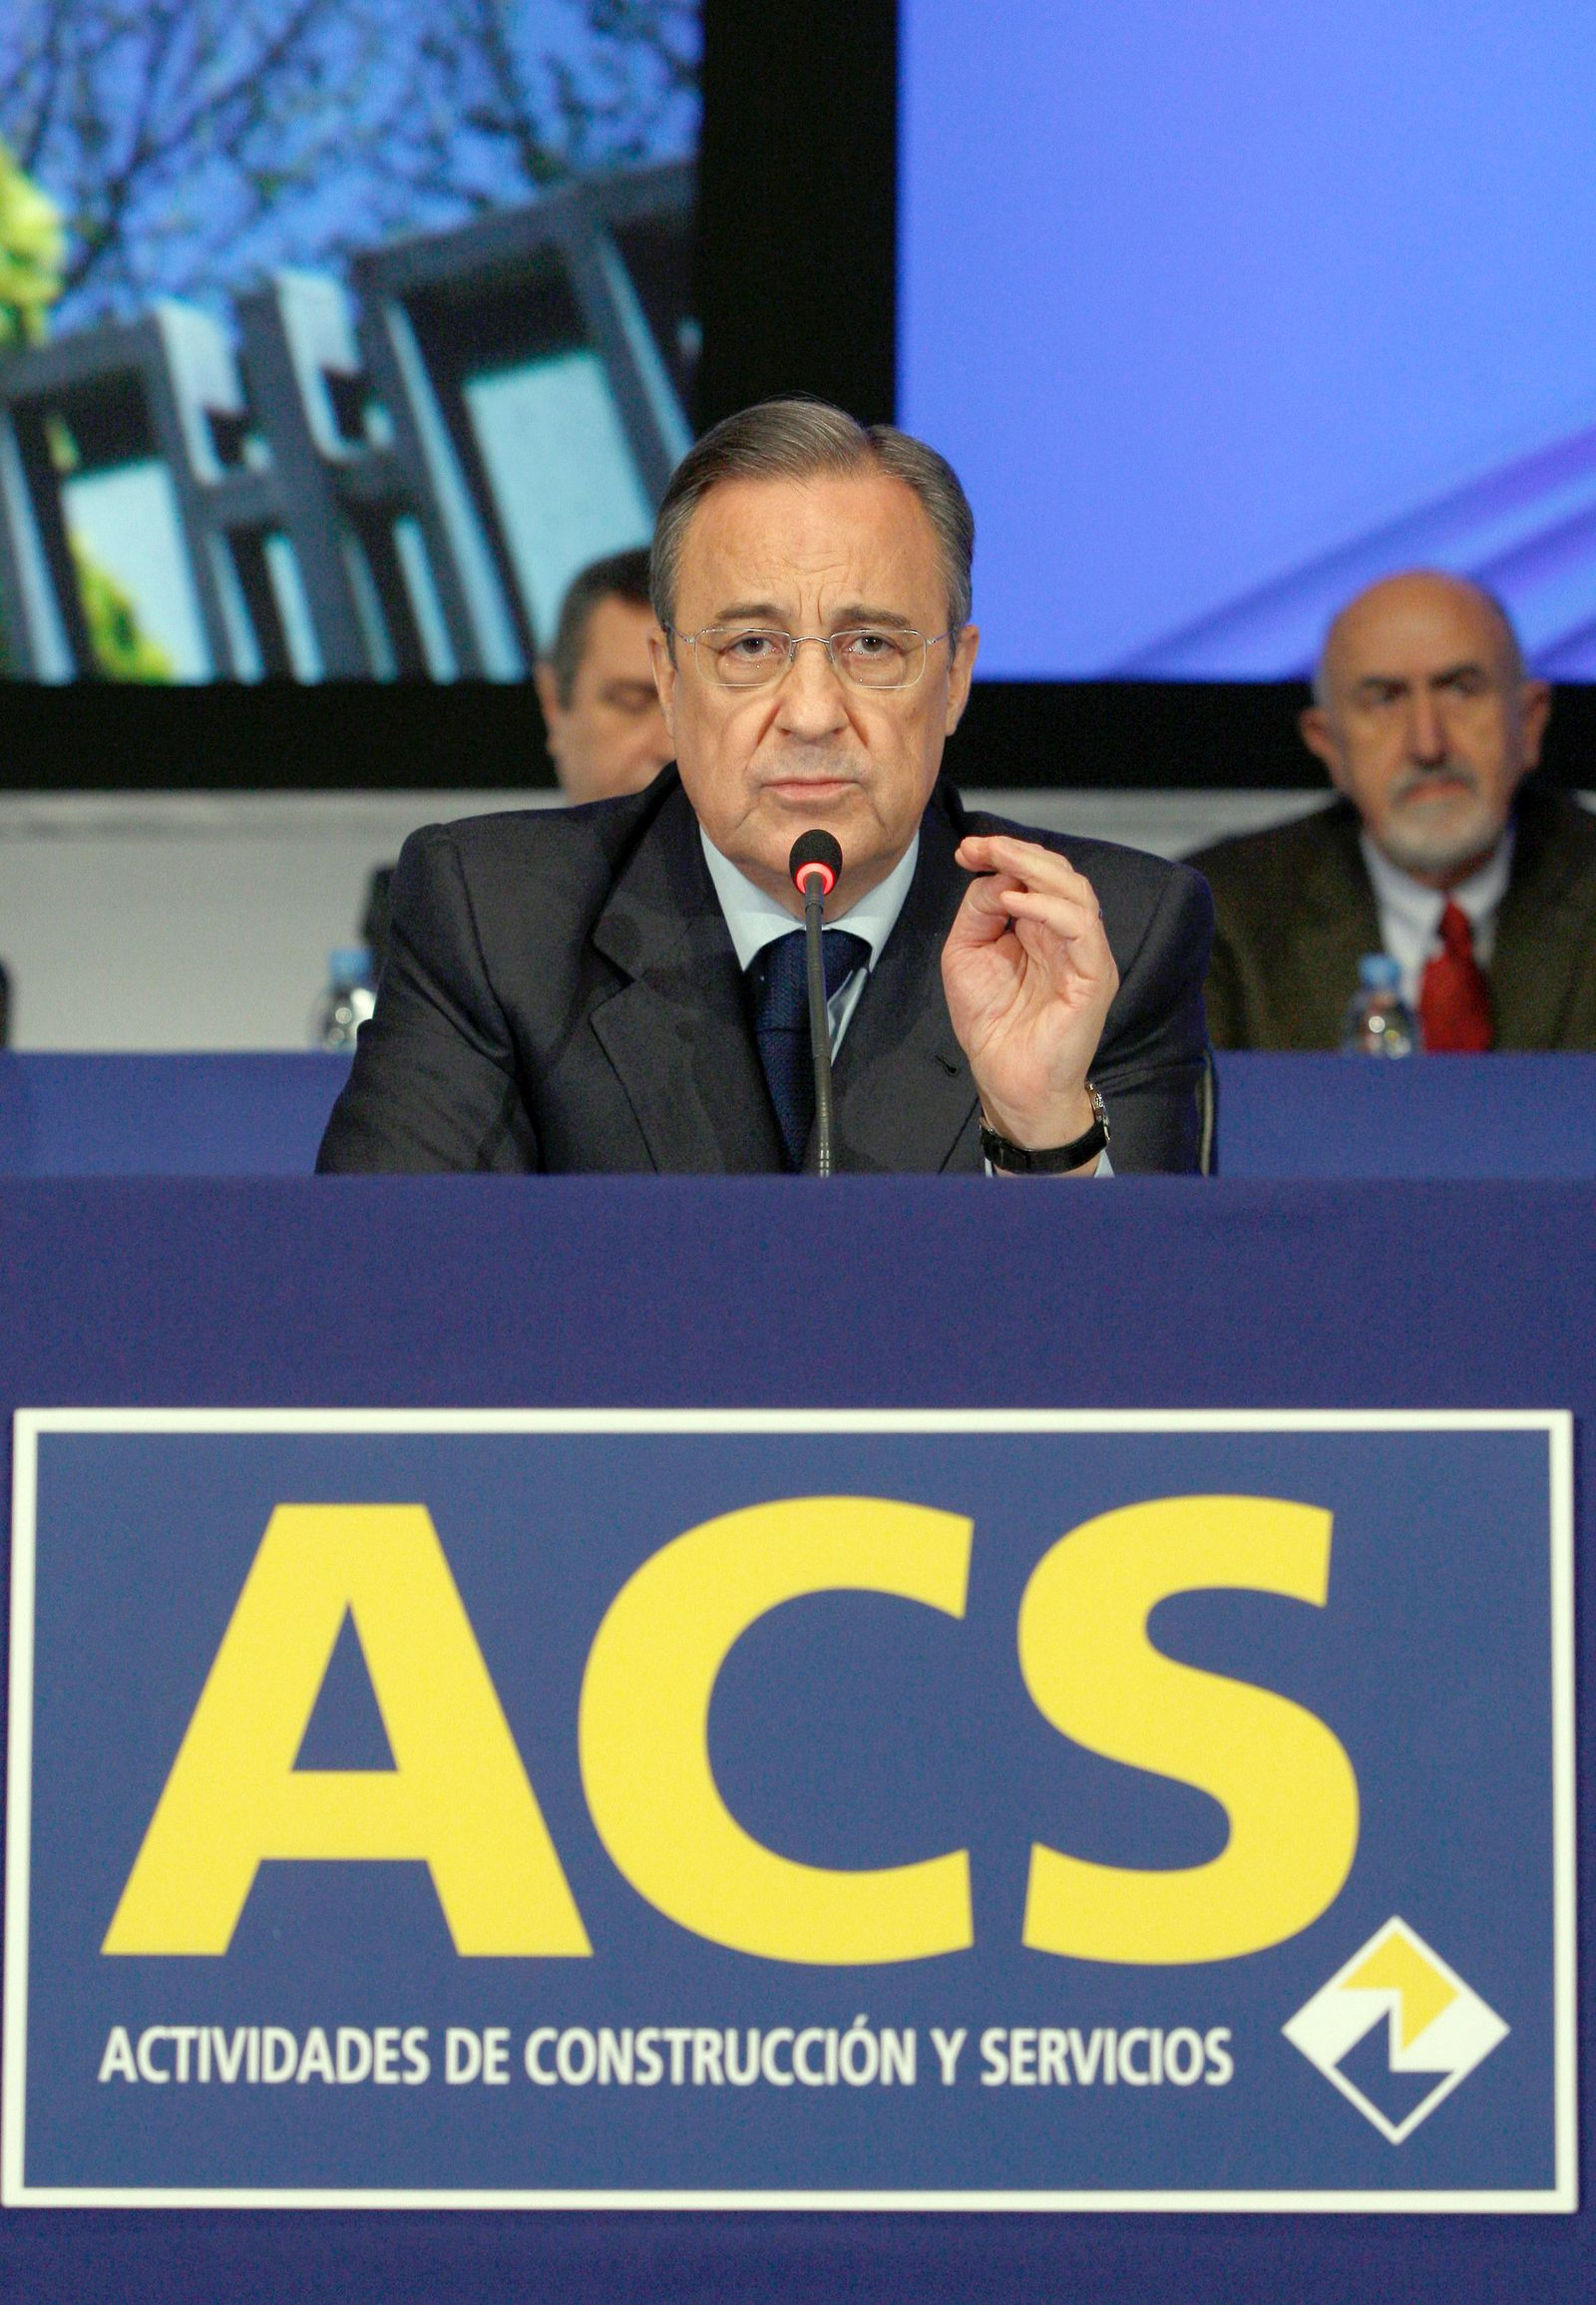 ACS-Aktionäre billigen Kapitalerhöhung